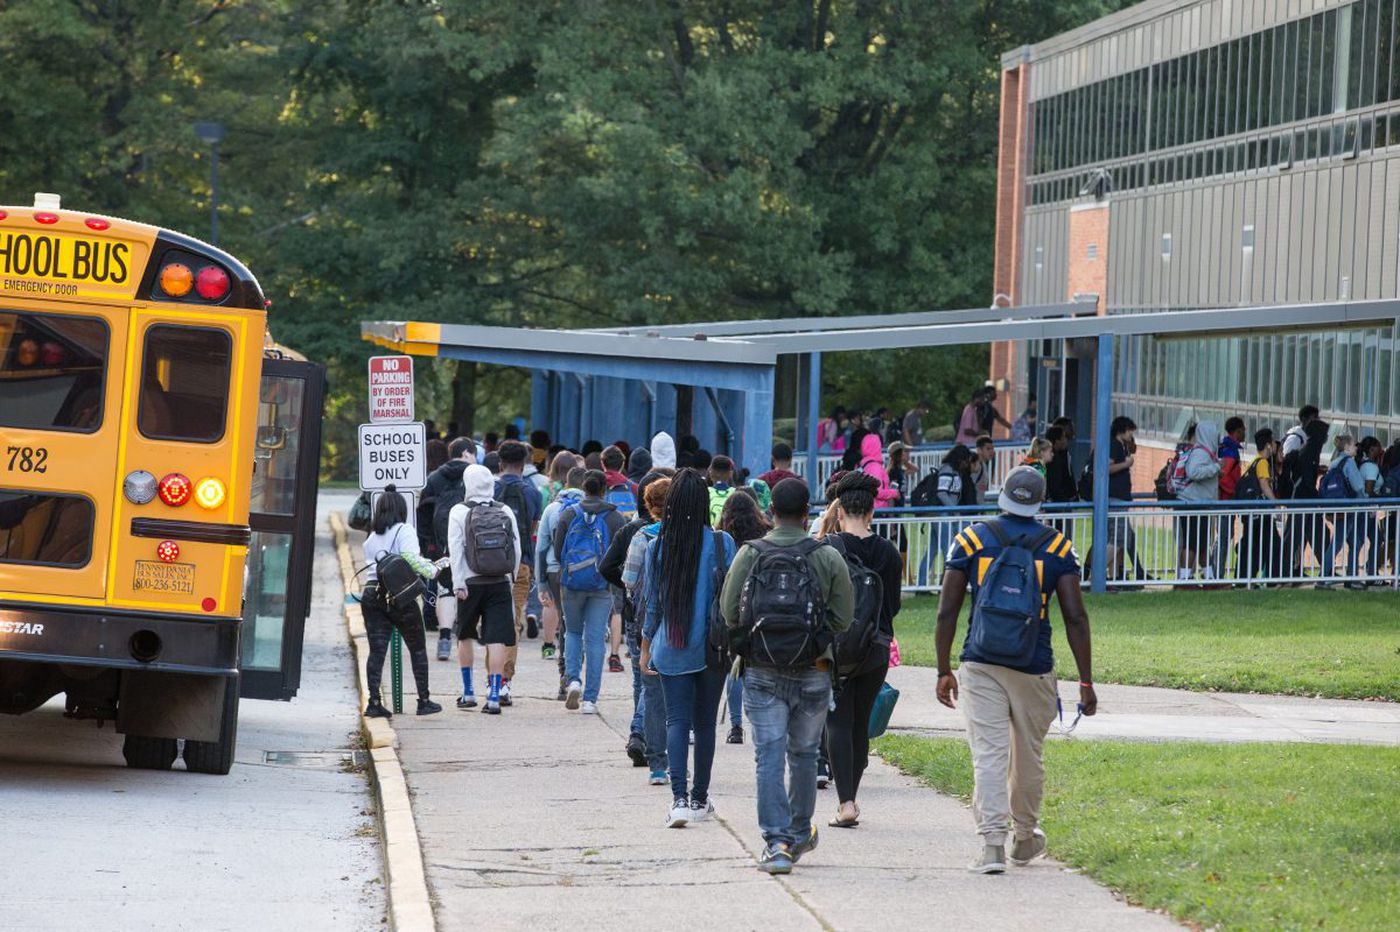 School racial incidents in Coatesville, Washington Twp. and Quakertown: A recap